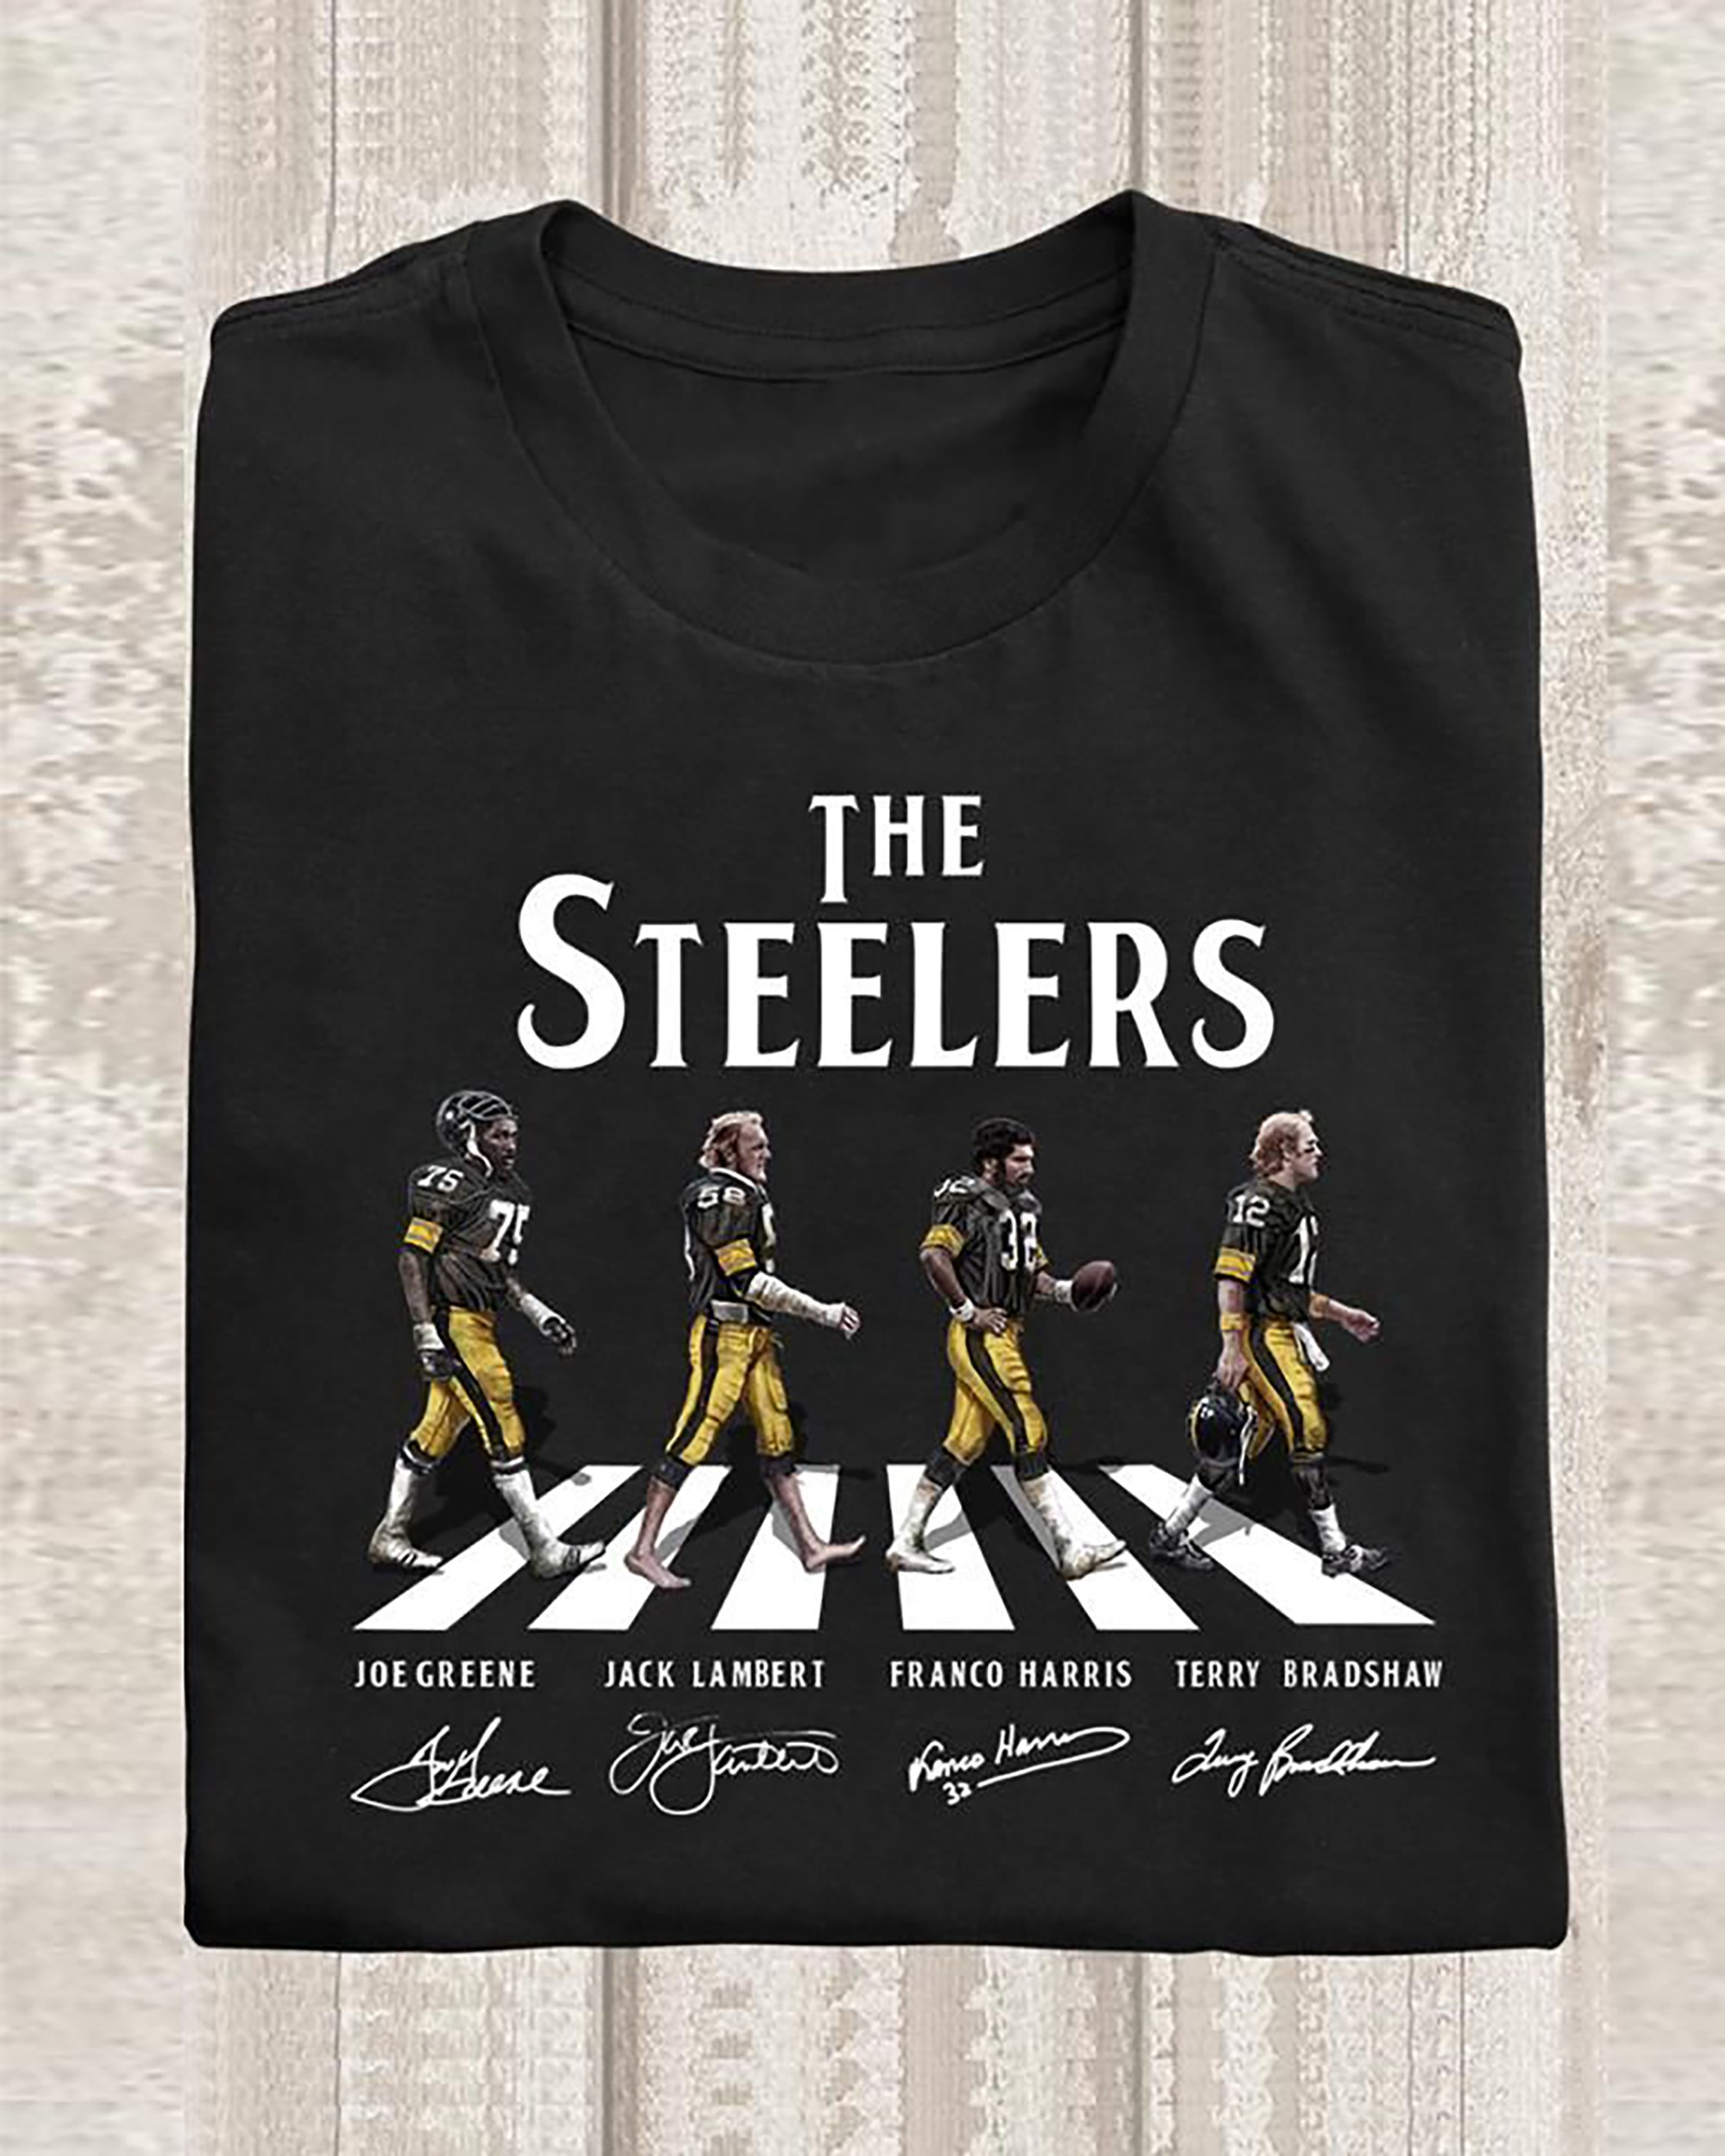 The Steelers Shirt Walking Abbey Road Signatures Shirt Steelers Gifts Pittsburgh Steelers Tshirt